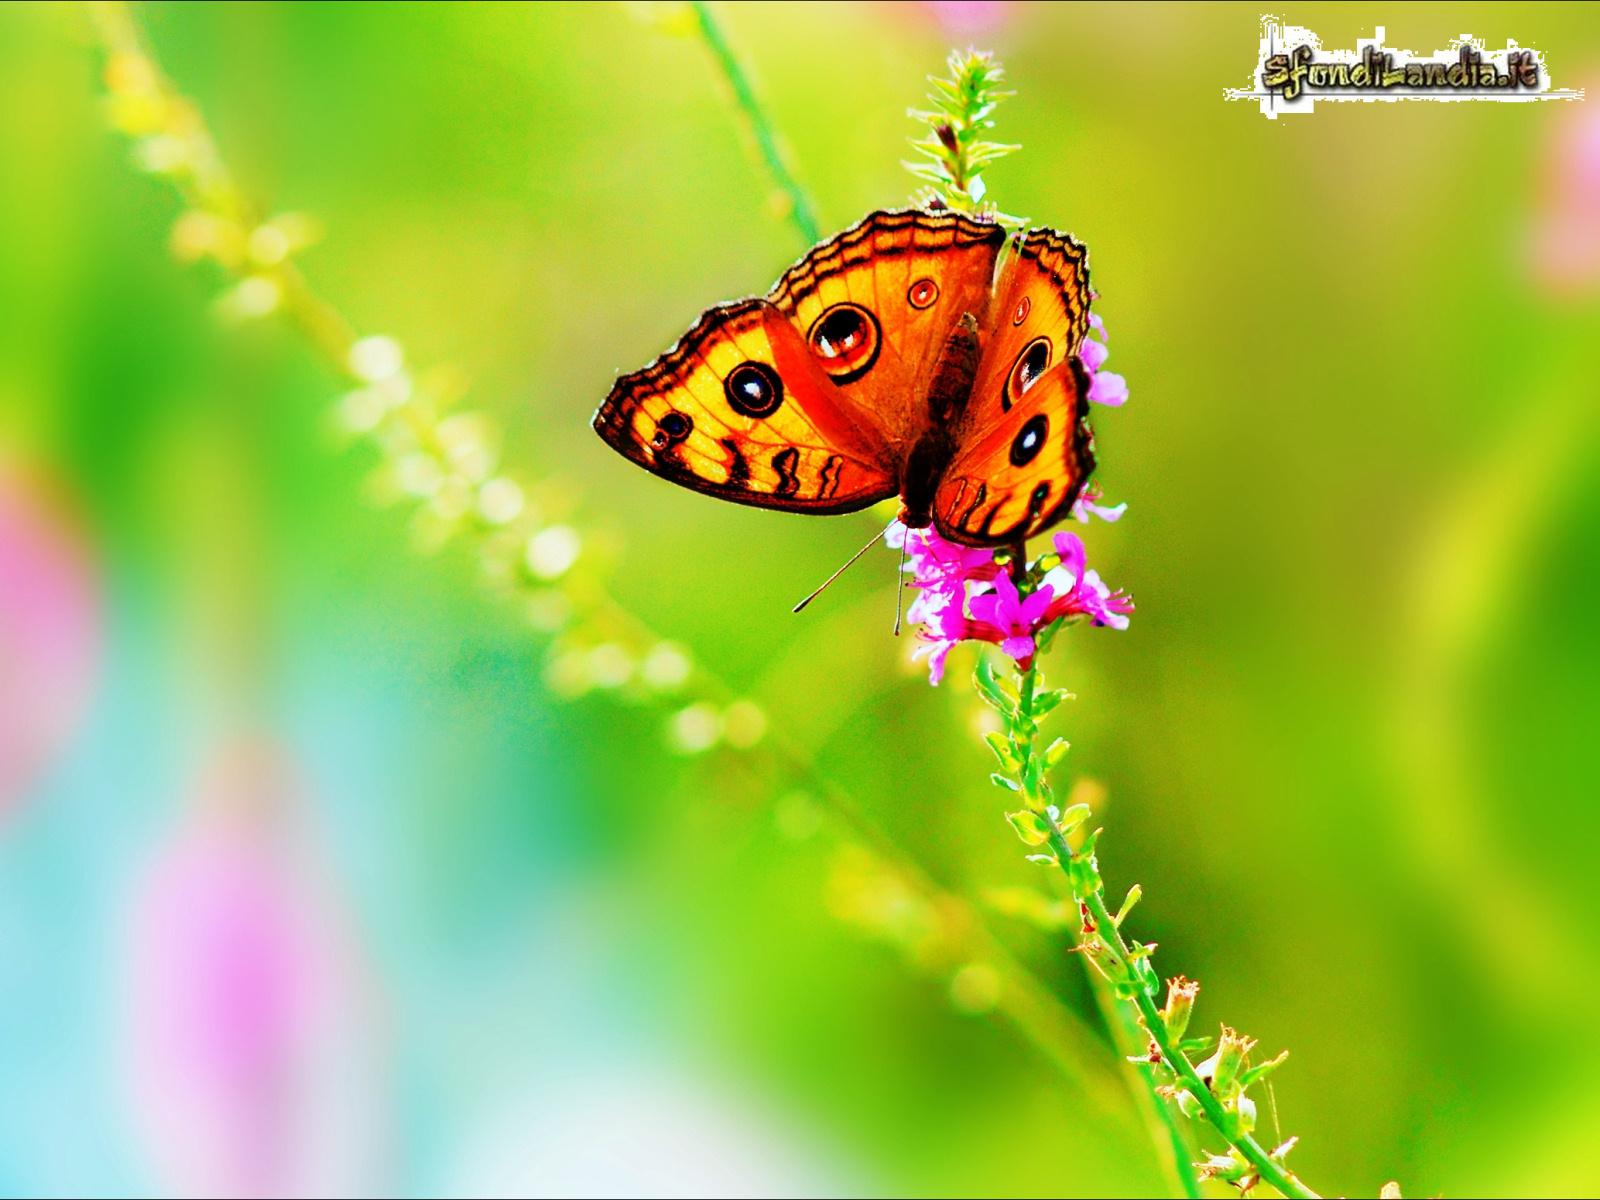 sfondi farfalle per cellulare fk26 regardsdefemmes